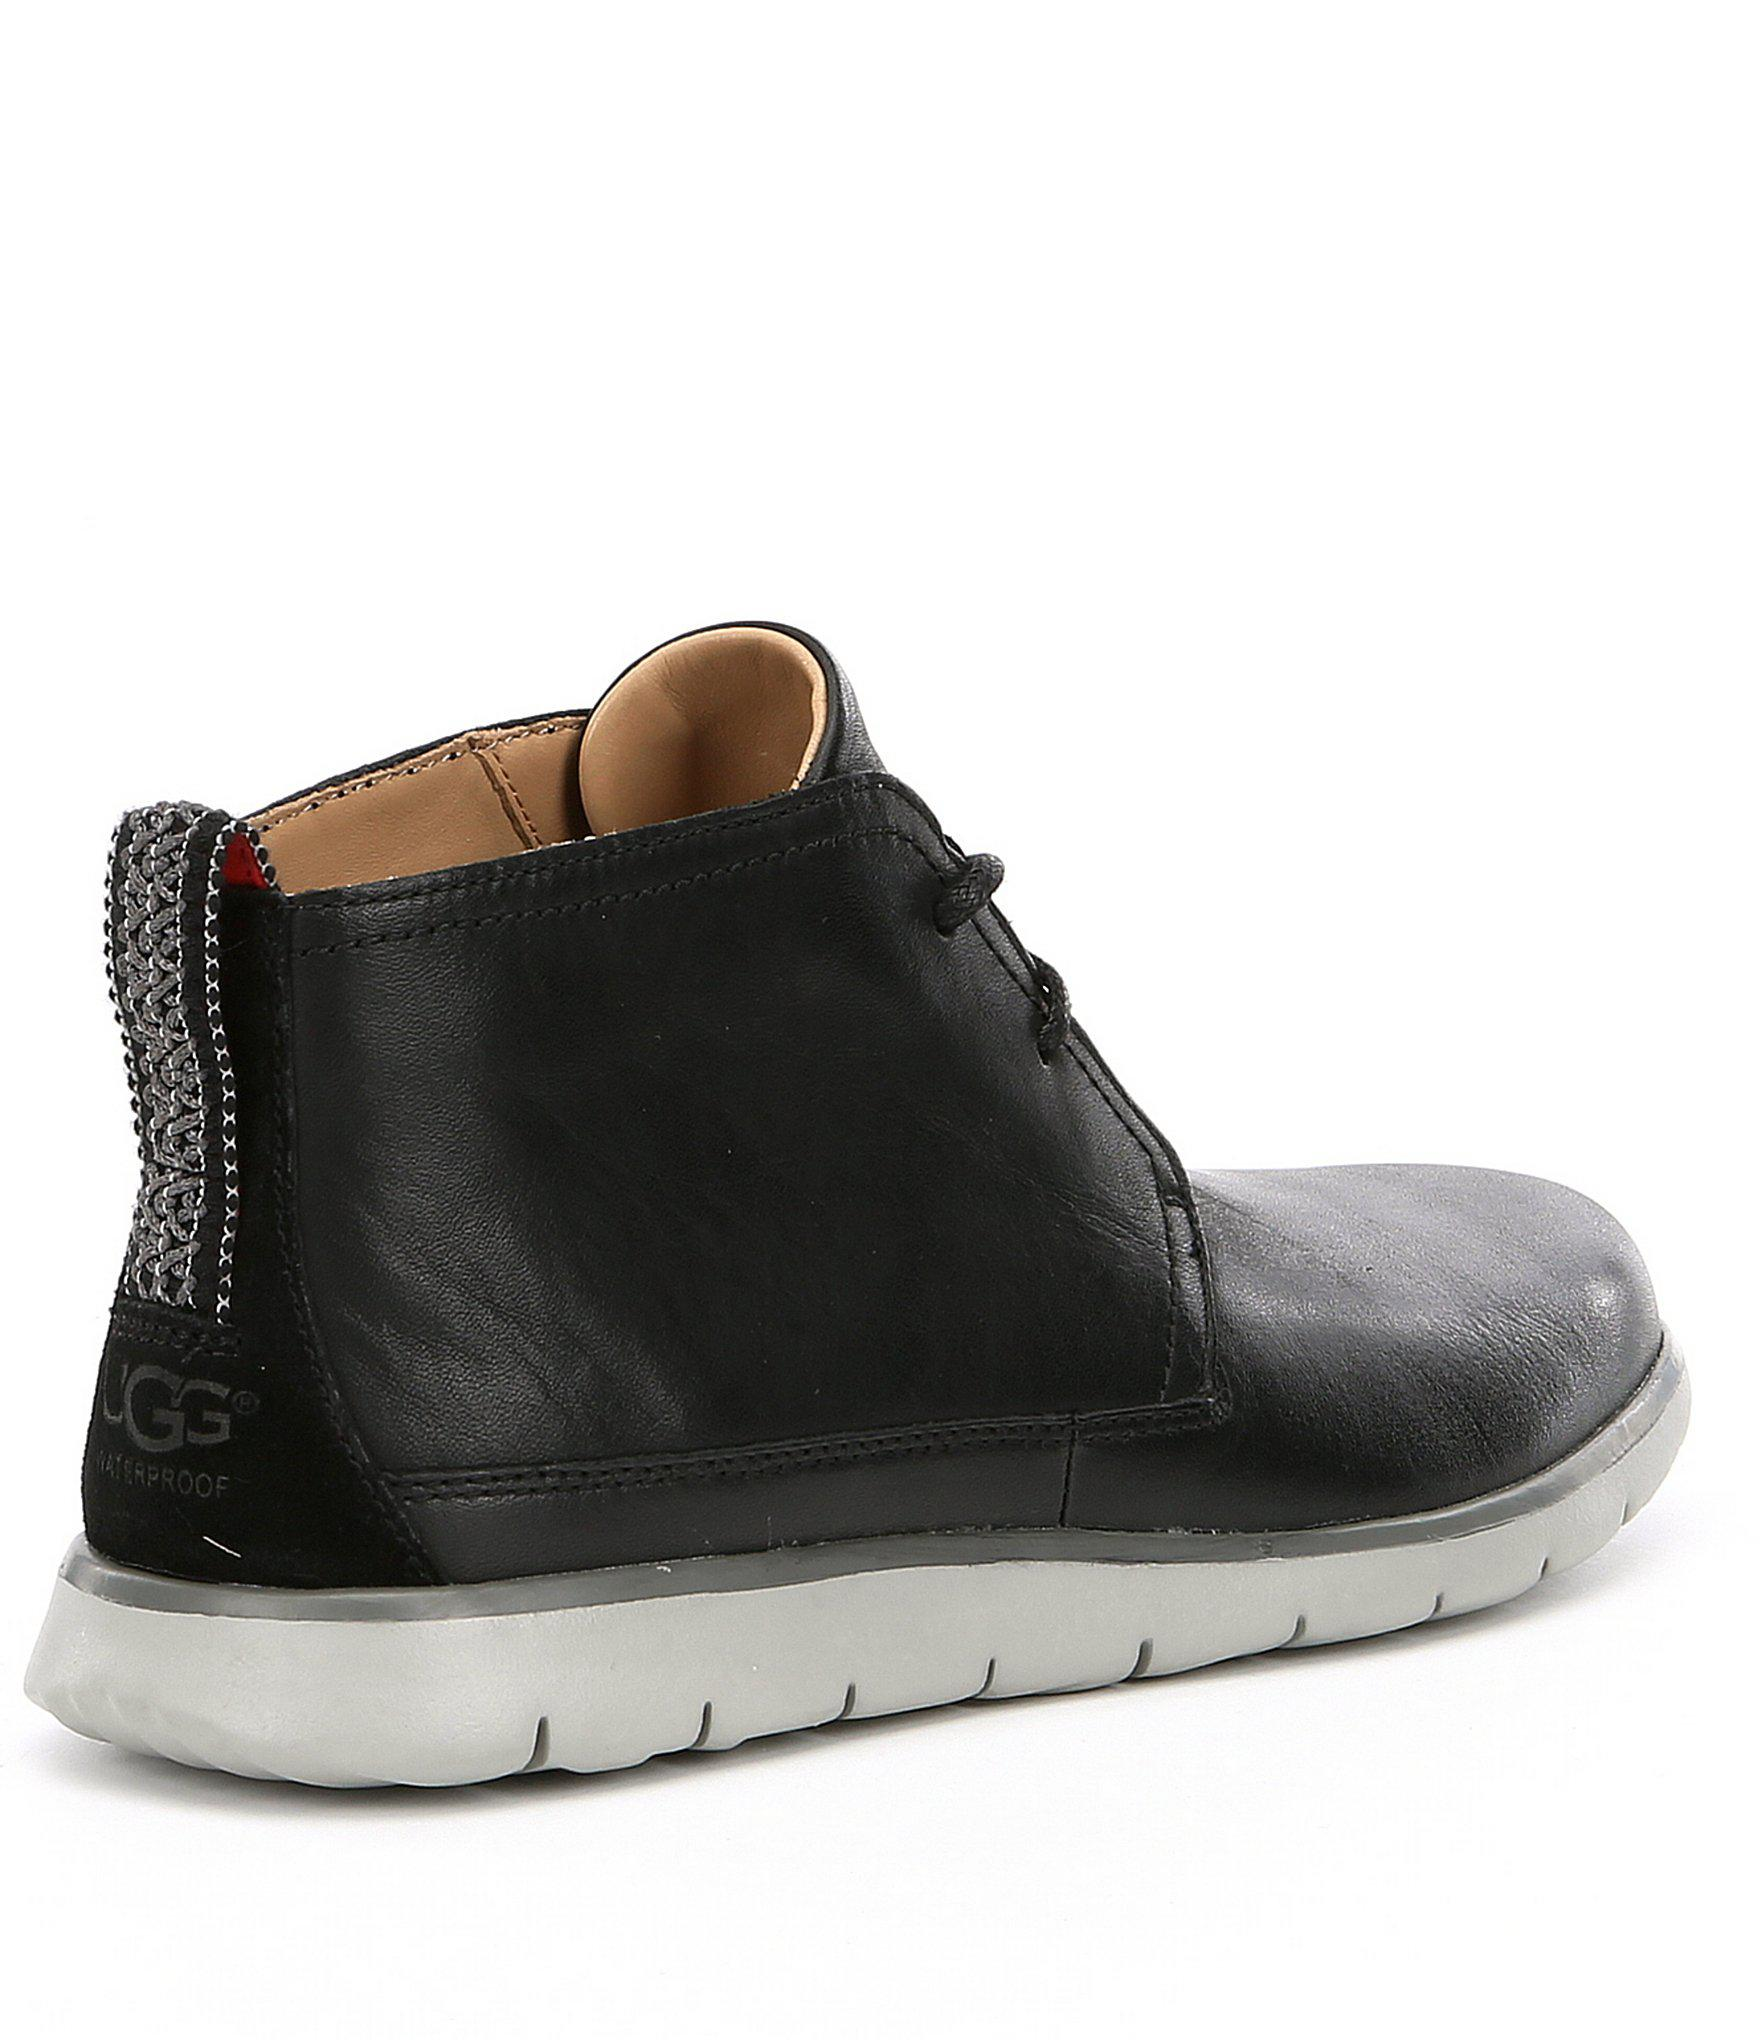 a8803caeb30 Ugg Black ® Men's Freamon Chukka Boots for men